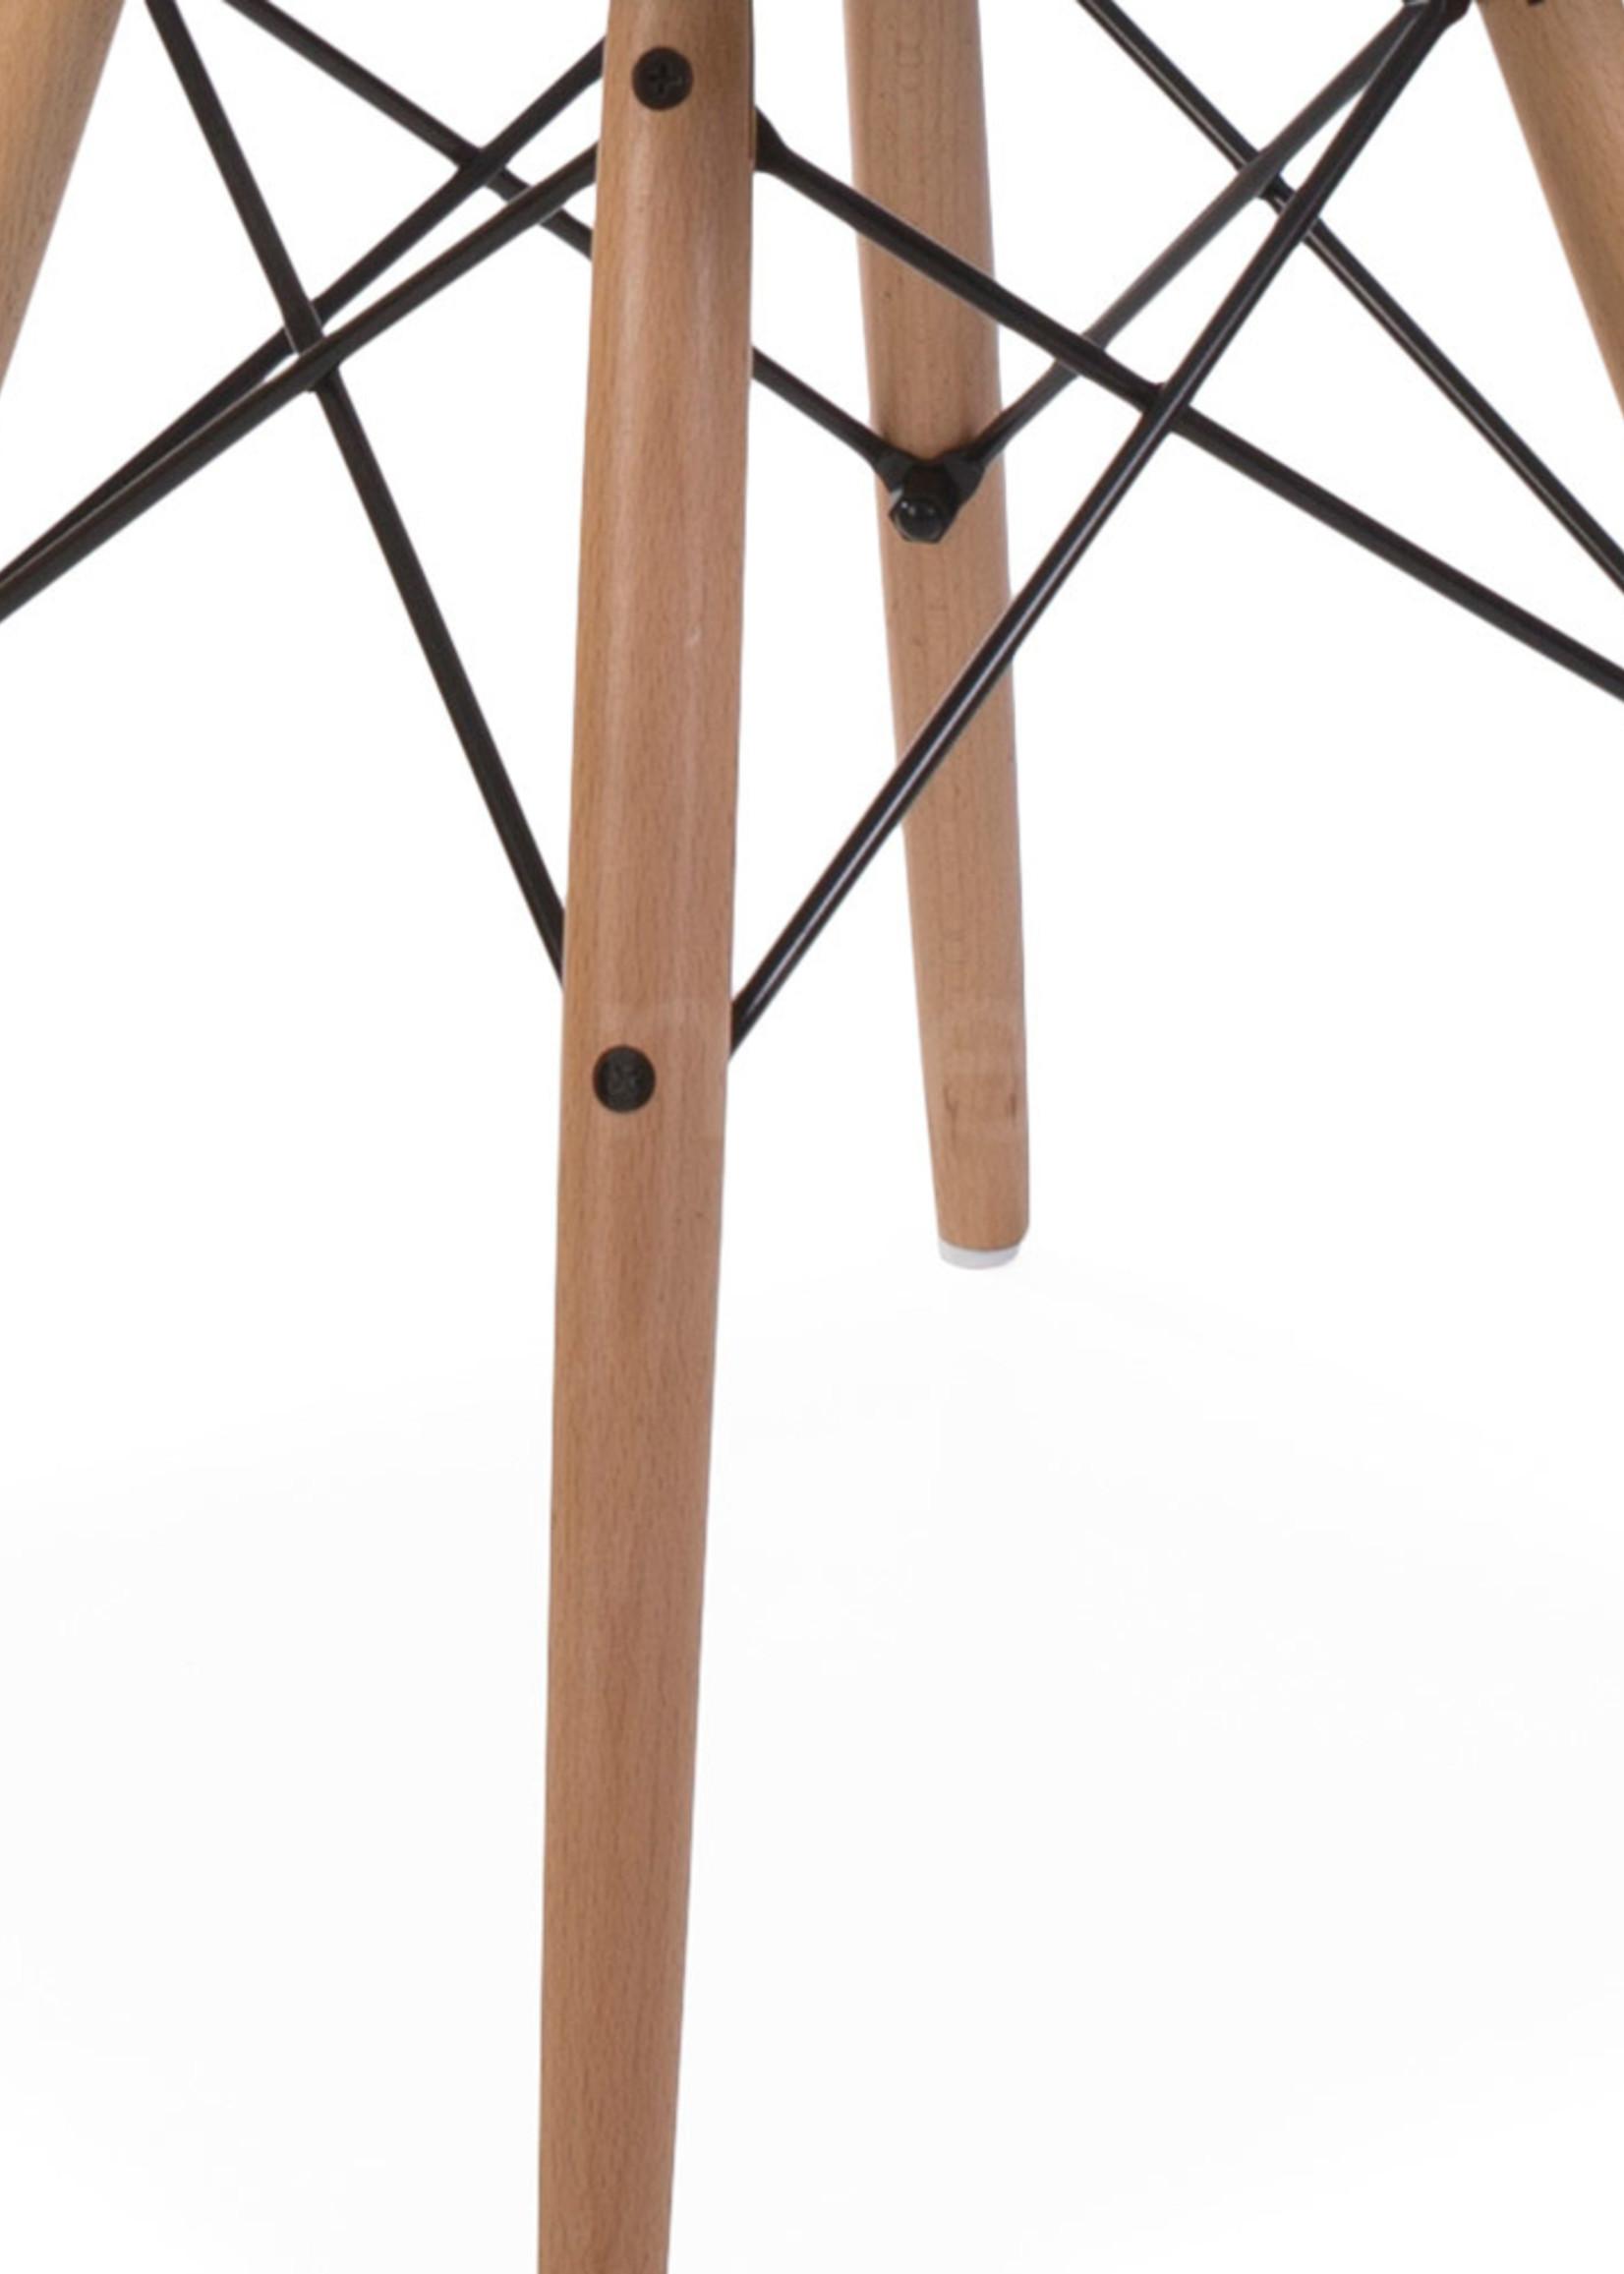 DSW Eames Design Stoel Licht-Terra